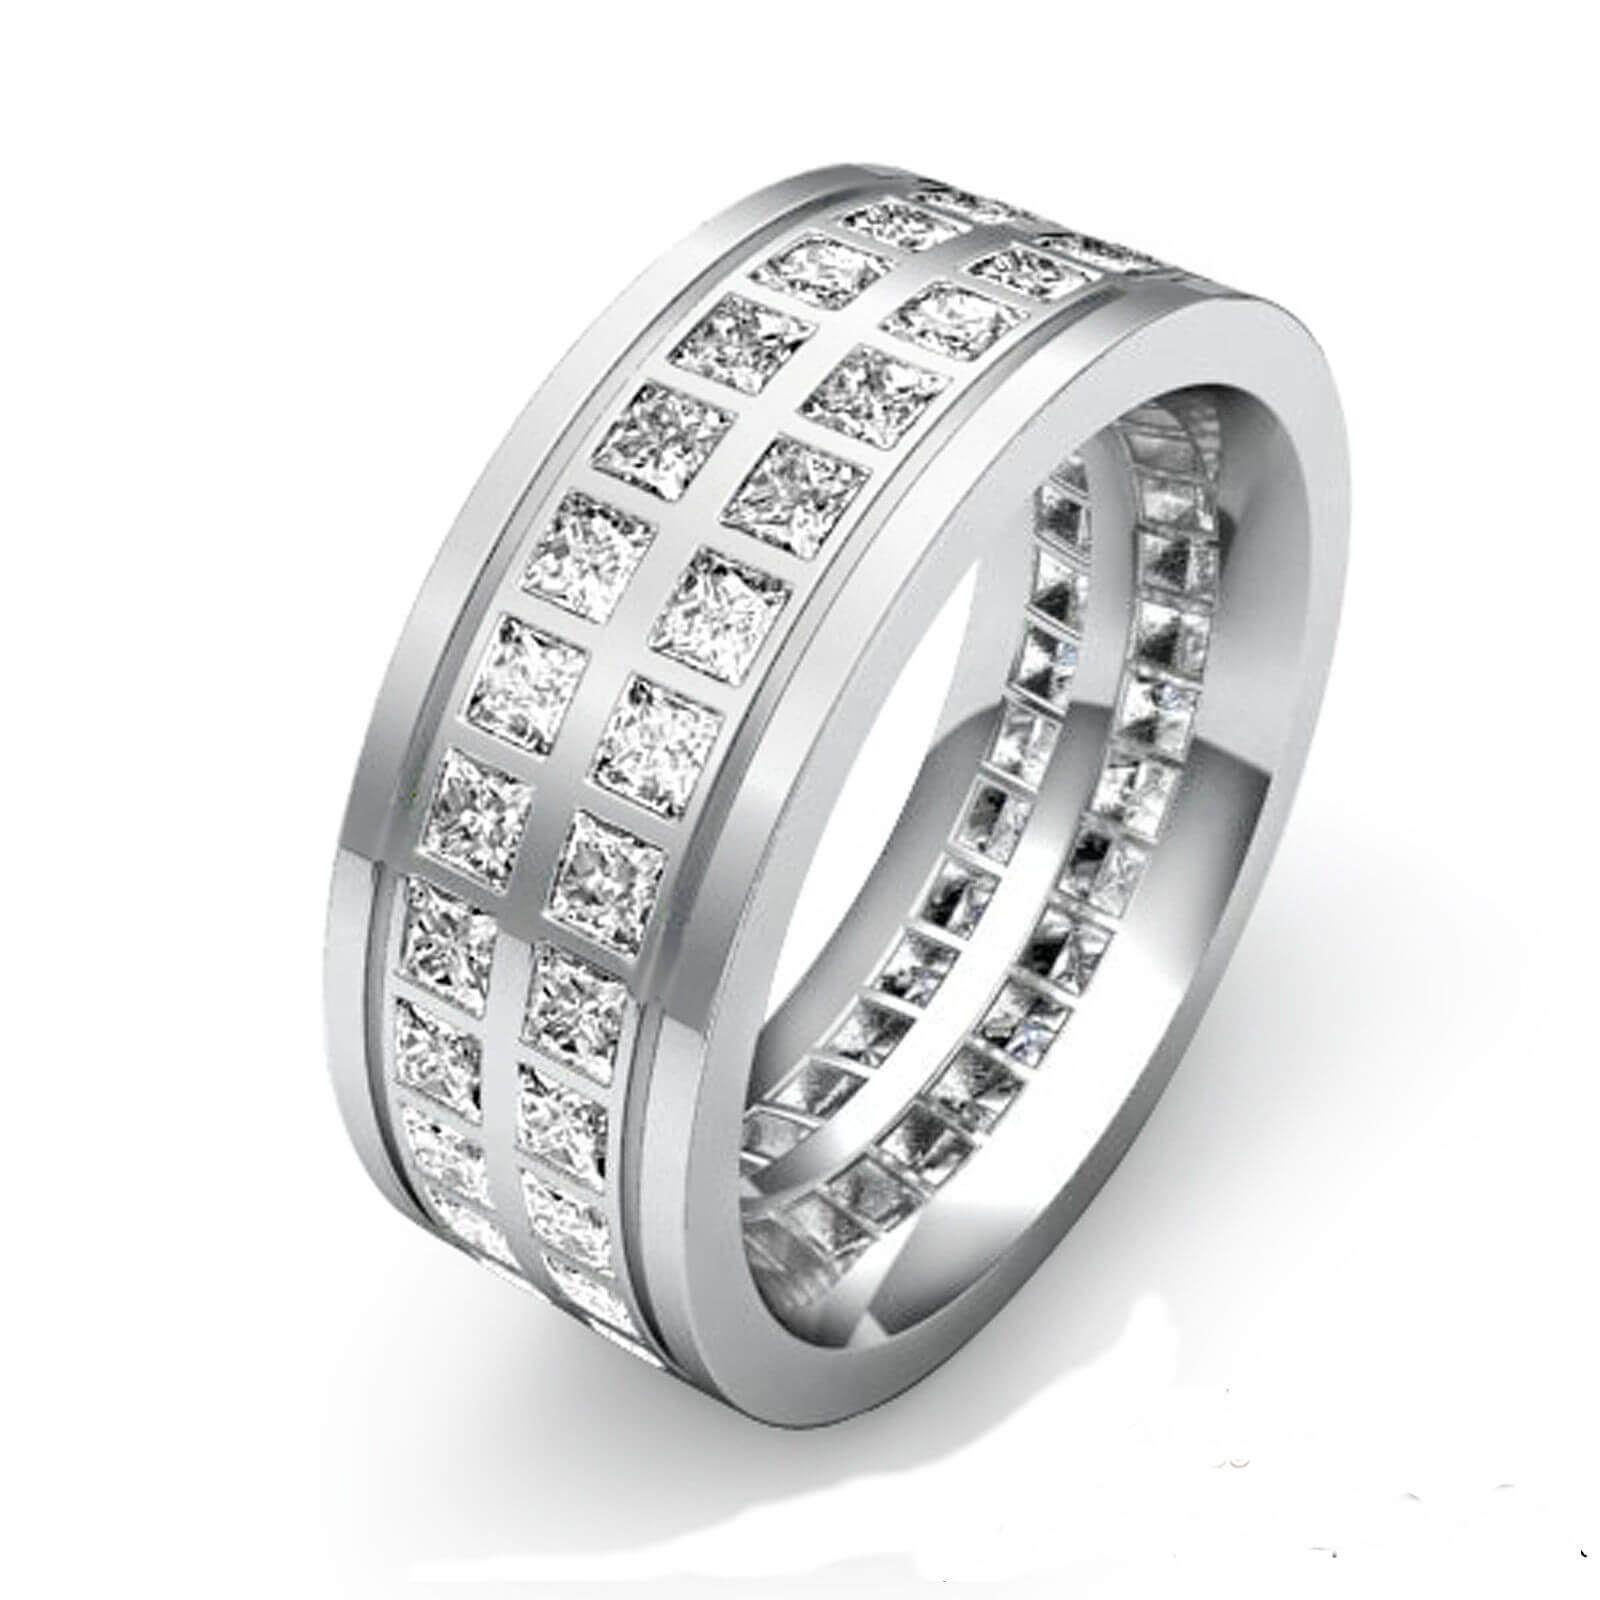 Men s 18ct white Gold 9mm 3 Carat Princess cut Diamond Wedding